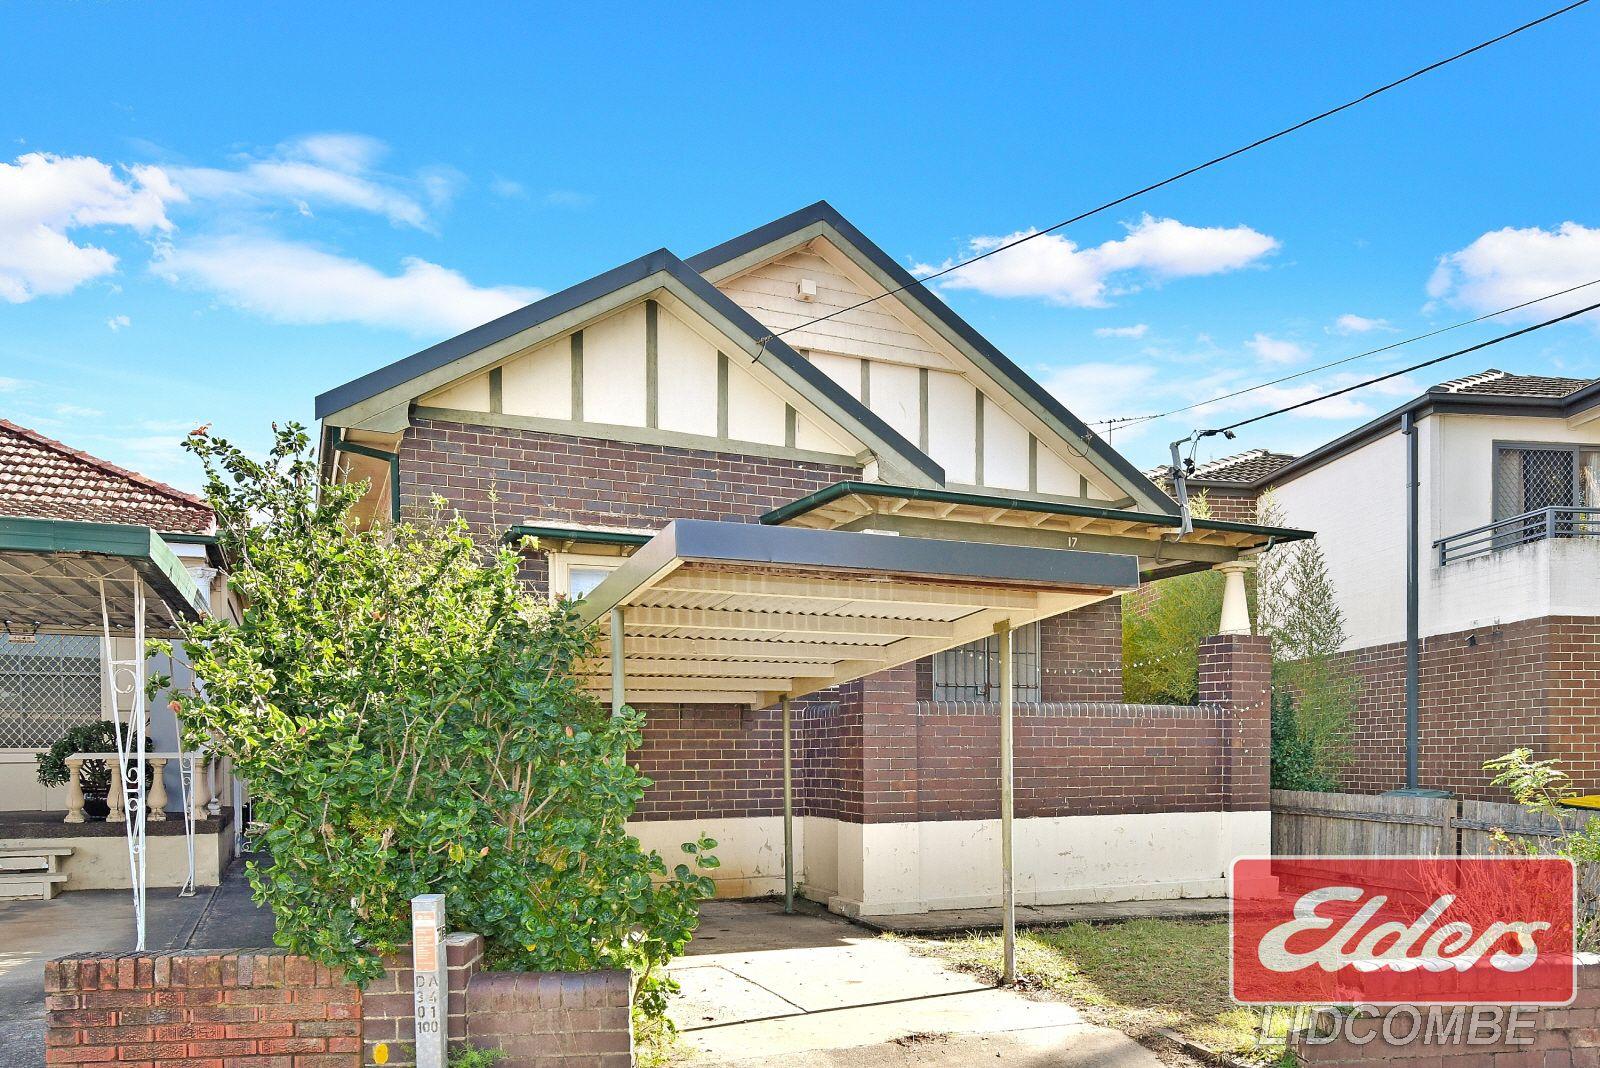 17 FRANCES STREET, Lidcombe NSW 2141, Image 0